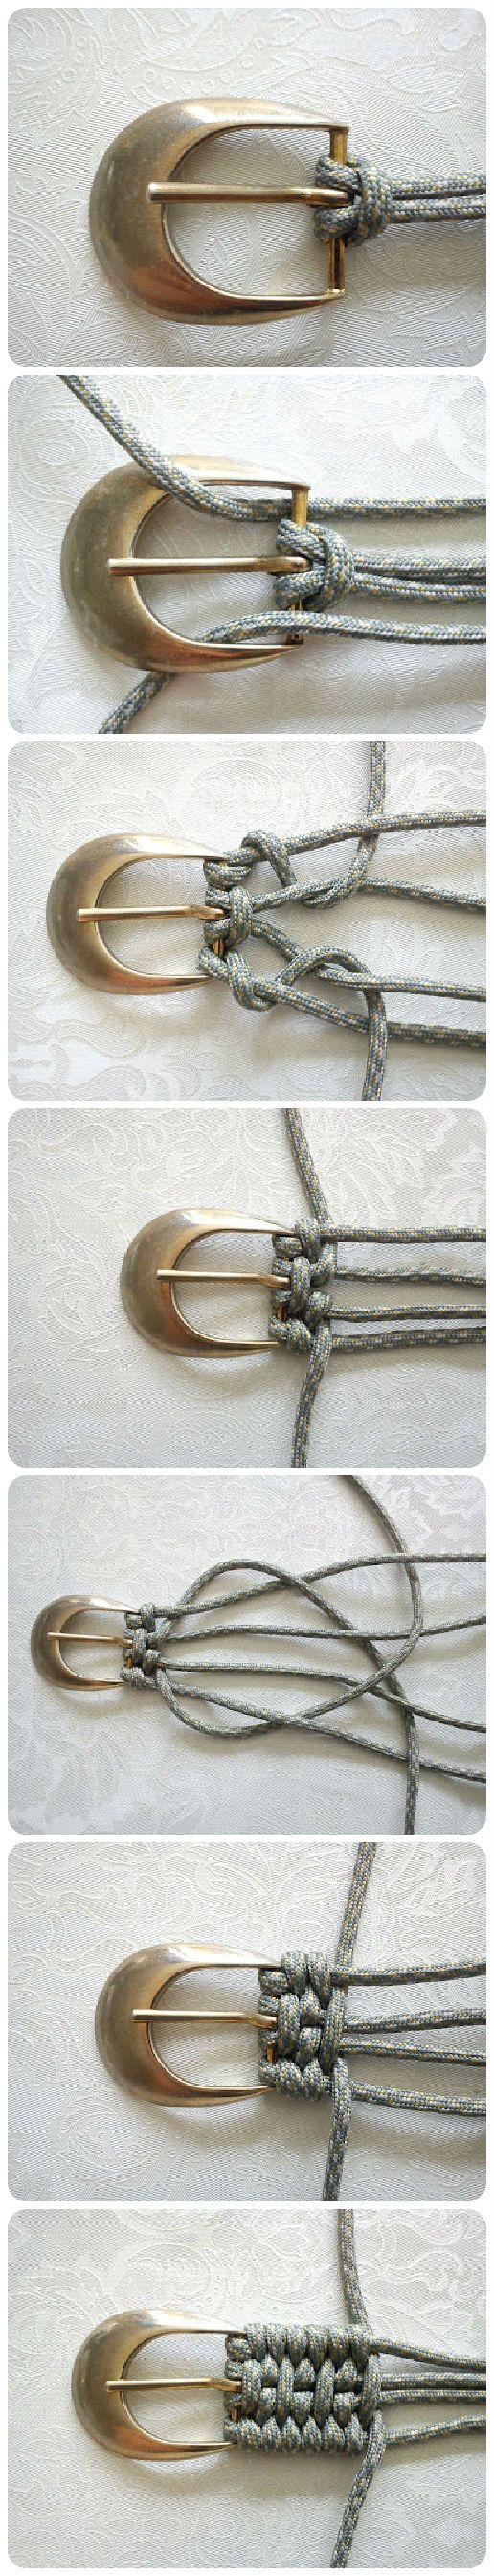 tutorial for weaving a belt michael kors outlet tassen